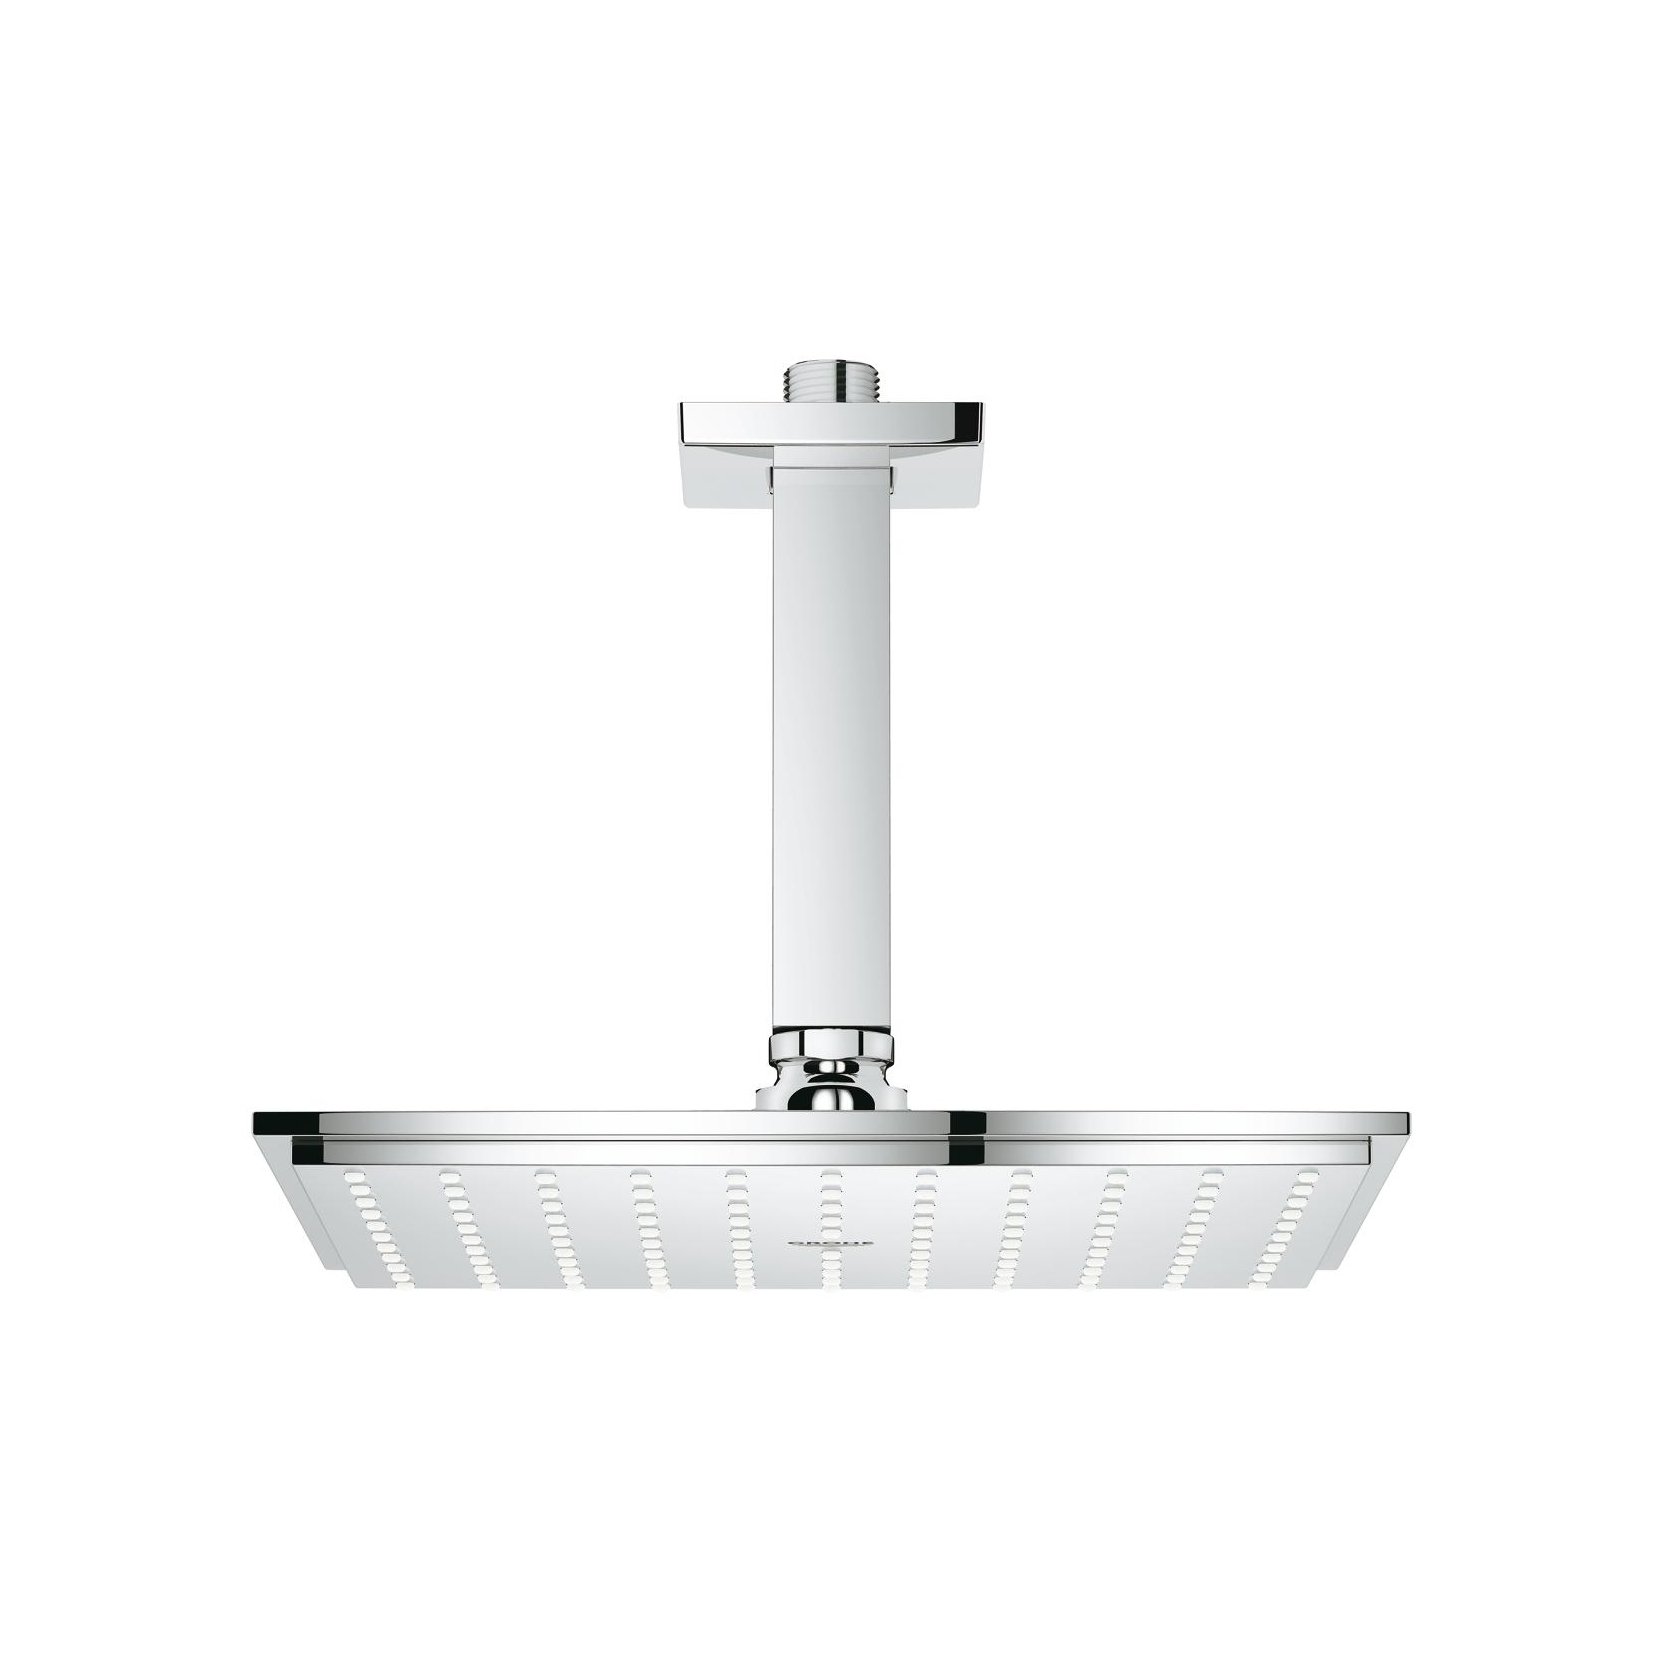 Grohe allure soffione doccia rainshower 230 a soffitto tattahome - Soffione doccia a soffitto ...